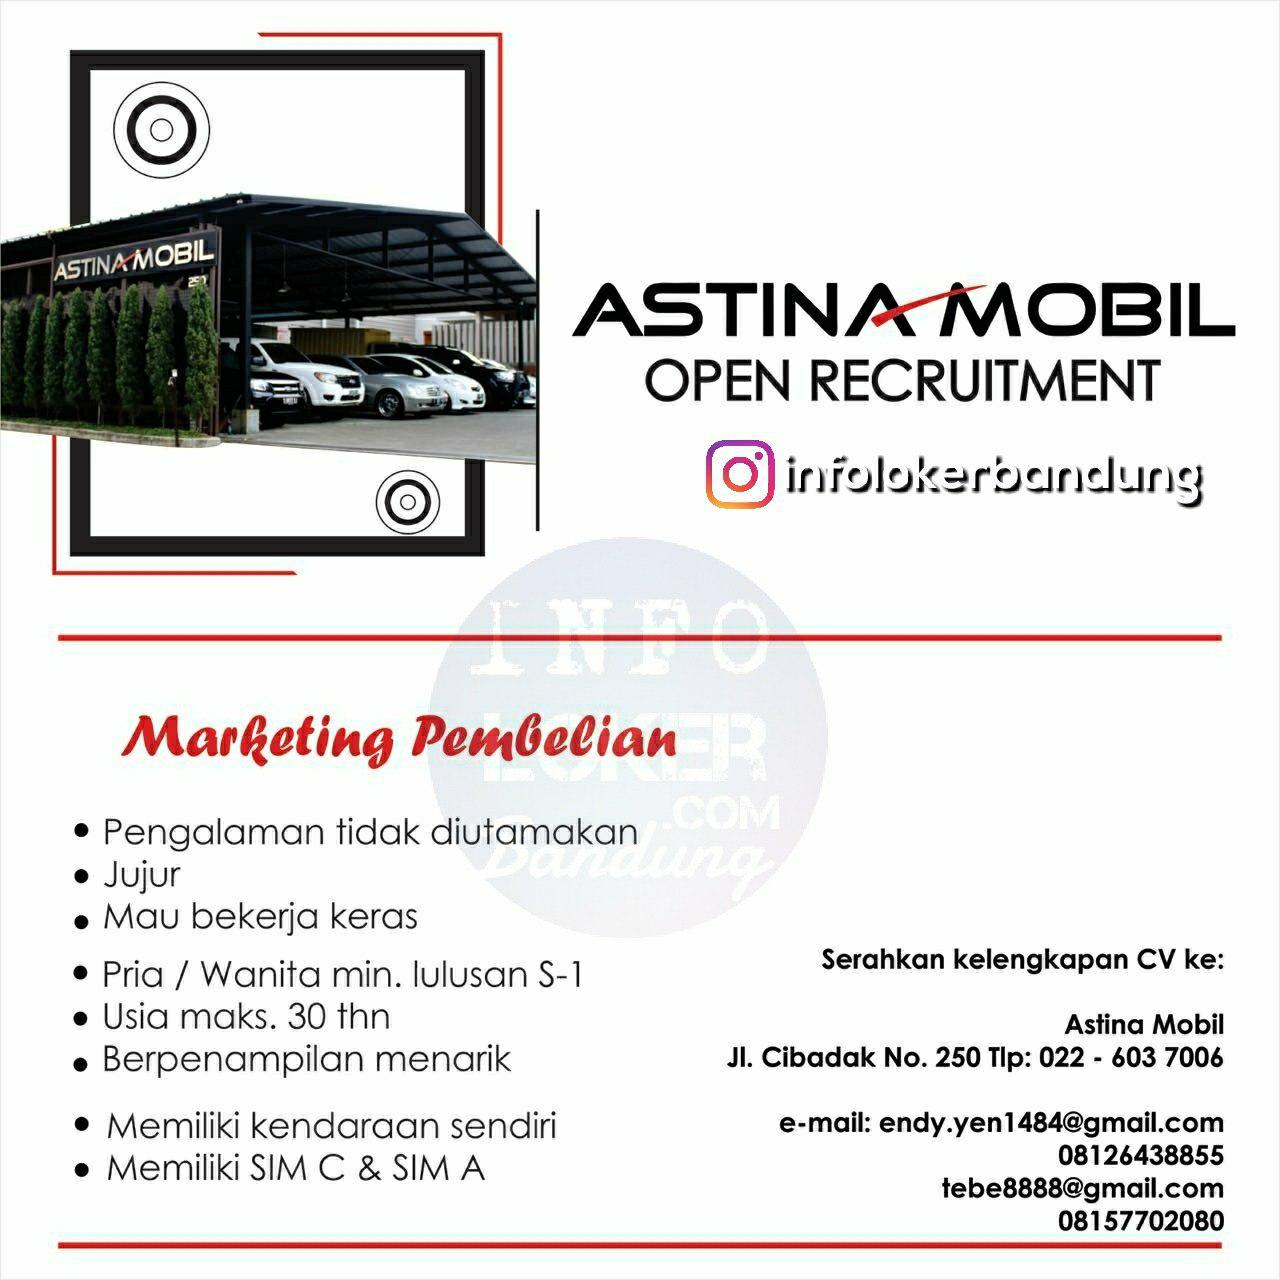 Lowongan Kerja Astina Mobil Bandung Juli 2018